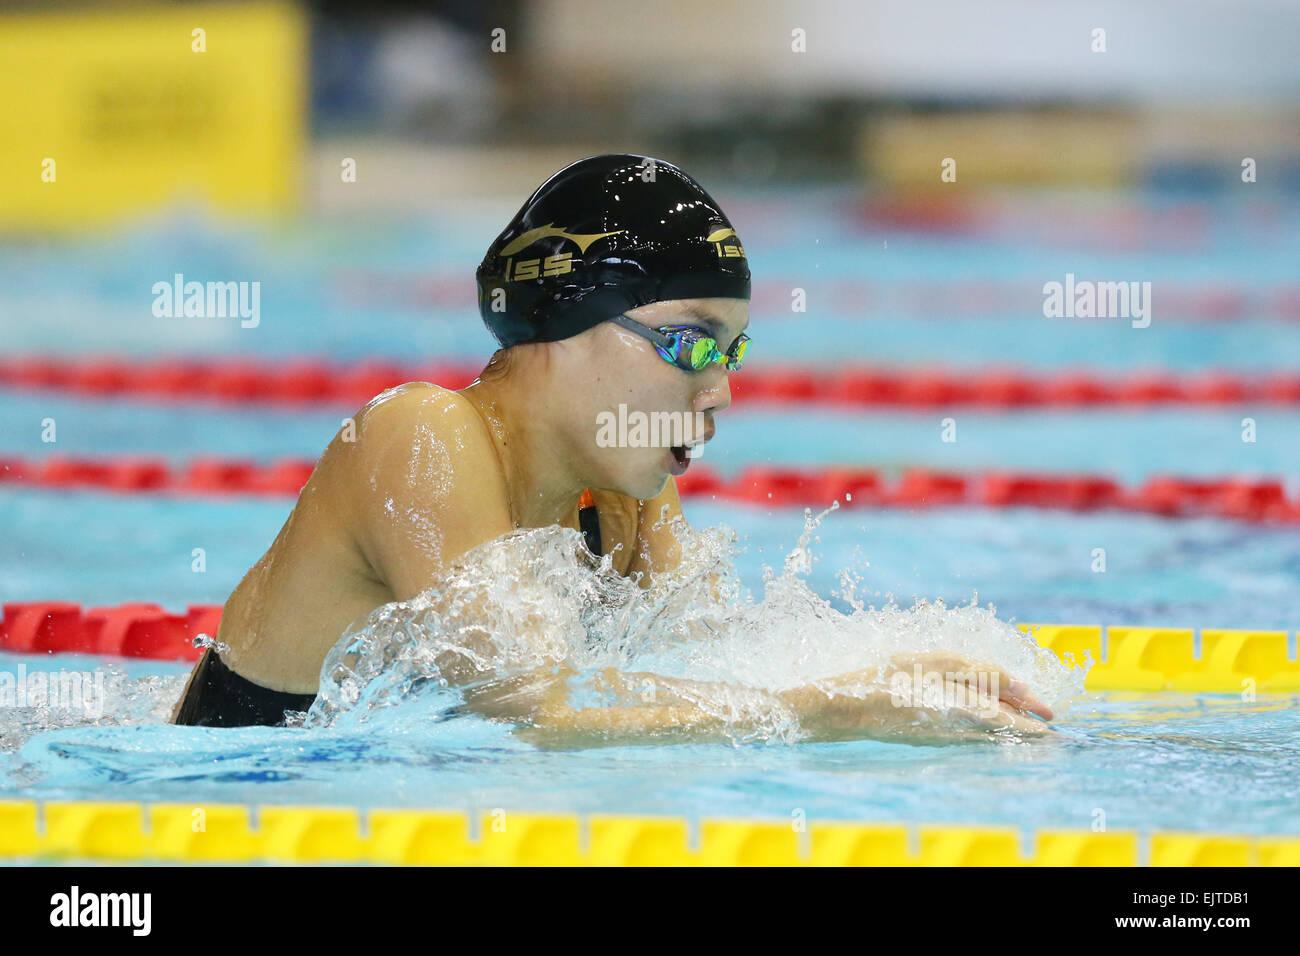 tatsumi international swimming pool tokyo japan 30th mar 2015 rika omoto march 30 2015 swimming the 37th joc junior olympic cup womens 200m - Olympic Swimming Pool 2015